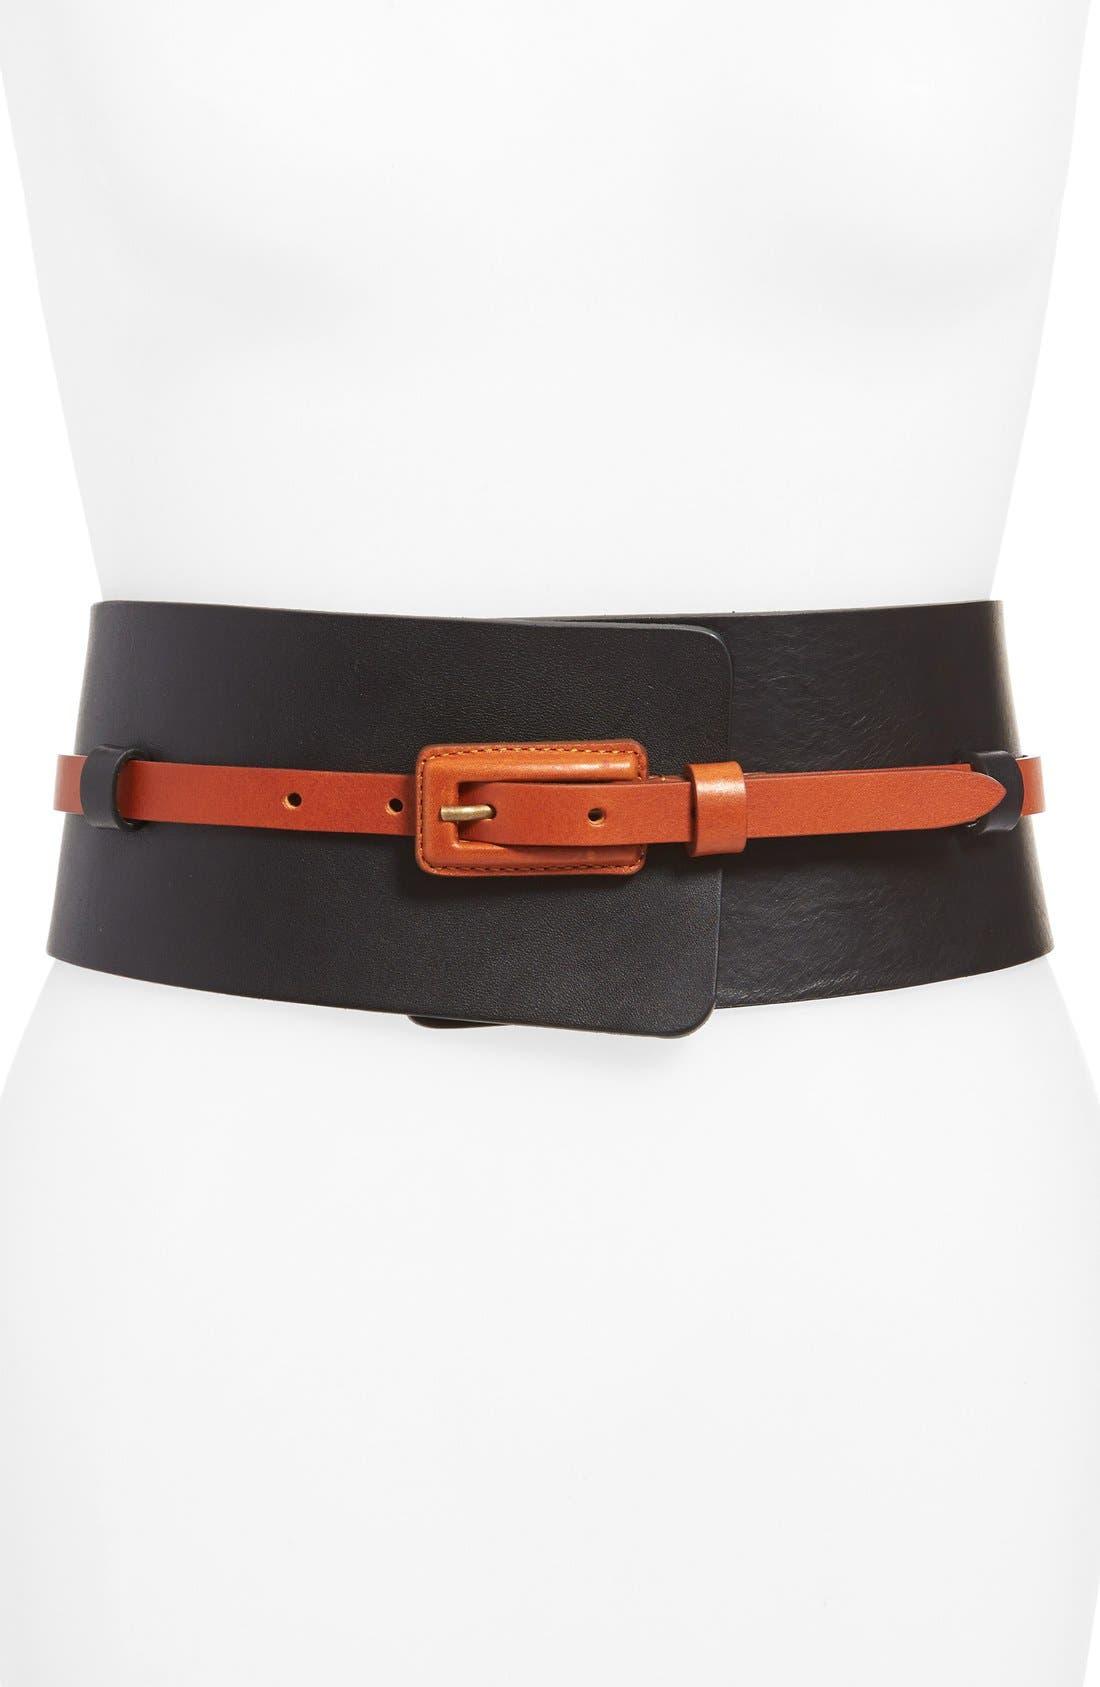 Alternate Image 1 Selected - Lafayette 148 New York Leather Obi with Detachable Skinny Belt